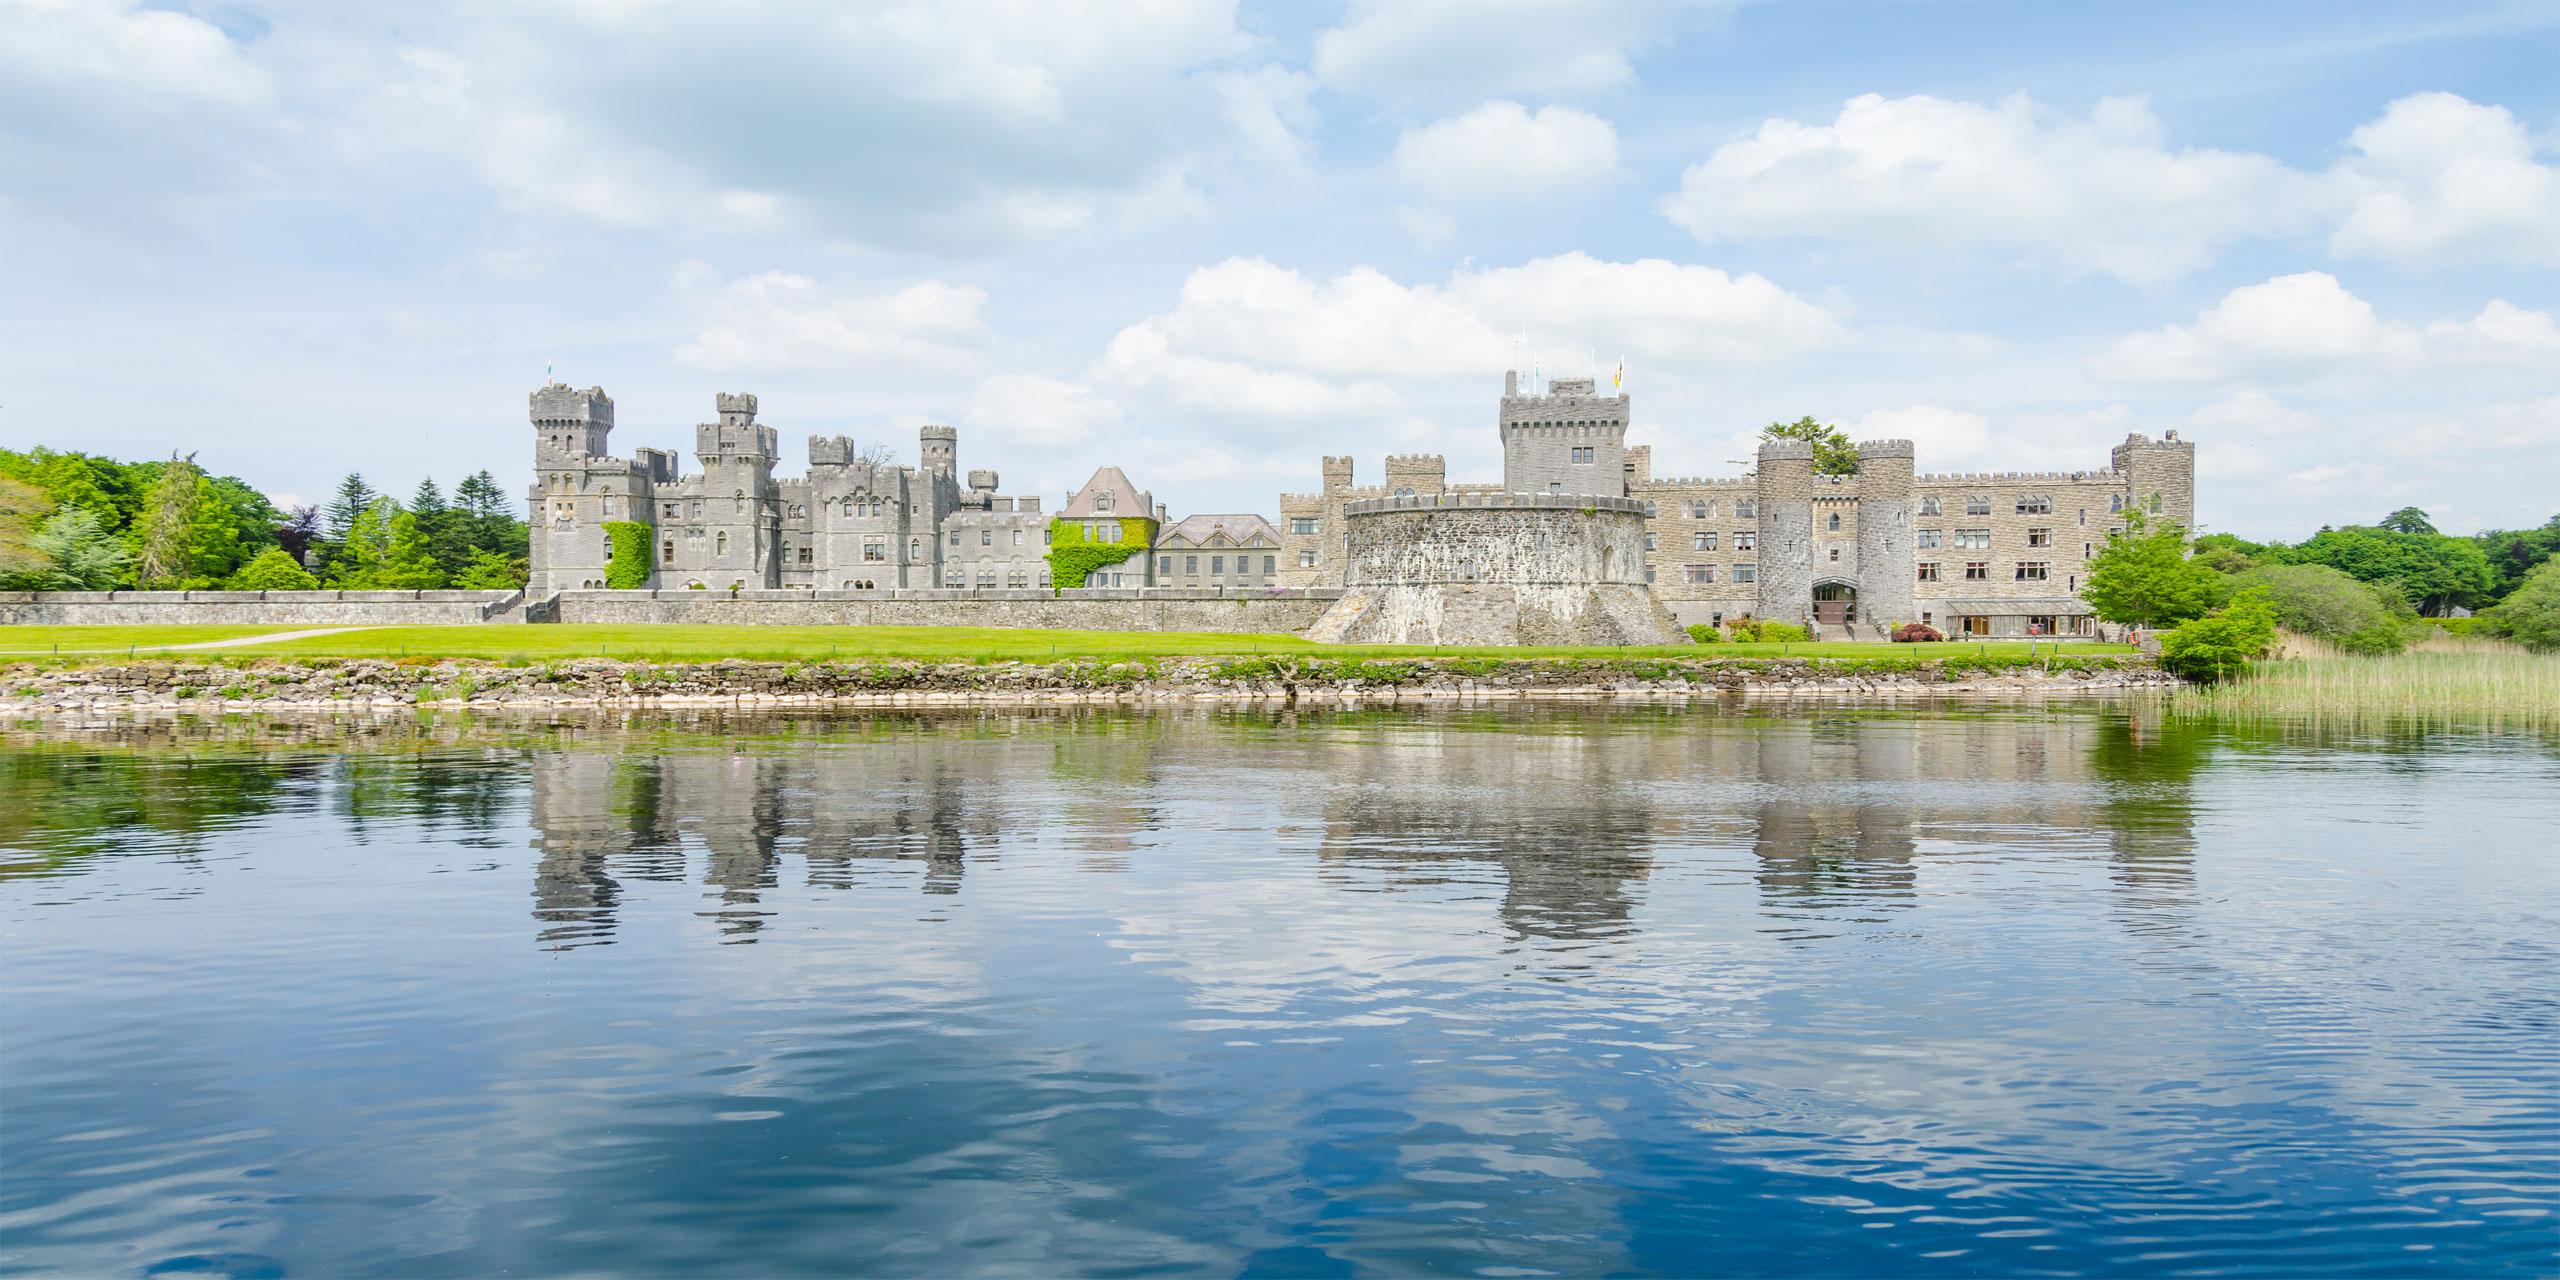 Ashford Castle; Courtesy of Elzbieta Sekowska/Shutterstock.com